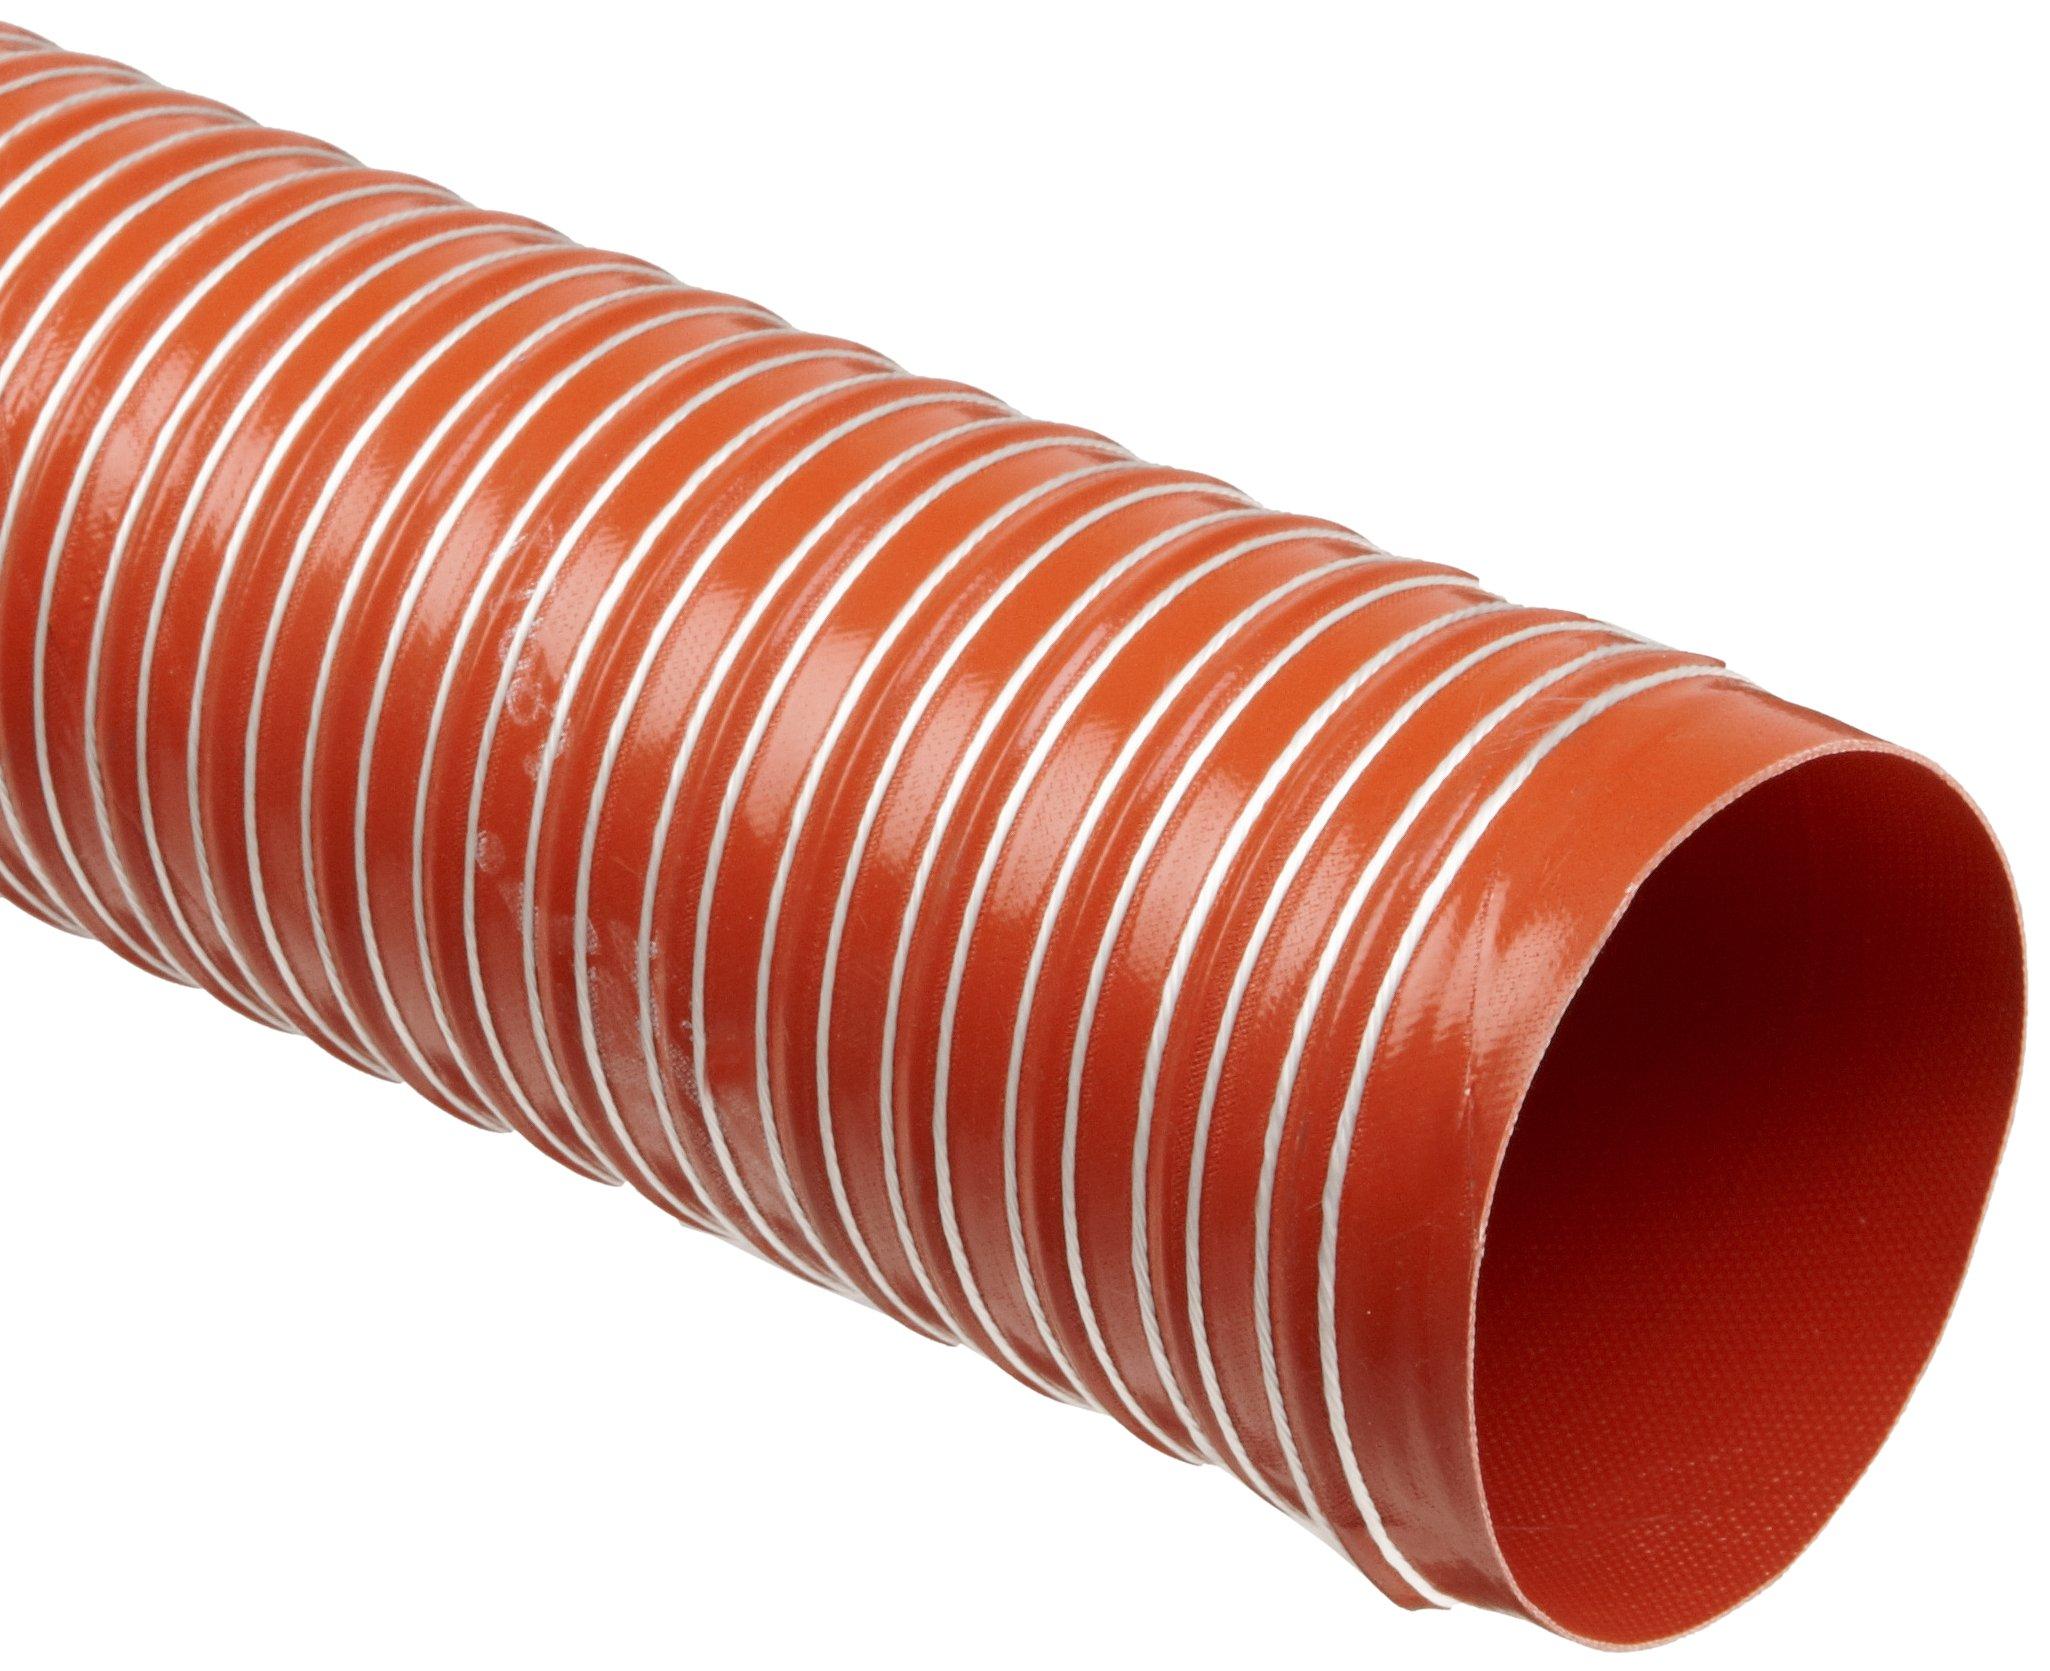 Heat-Flex GS Fiberglass Duct Hose, Iron Oxide Red, 4'' ID, 12' Length